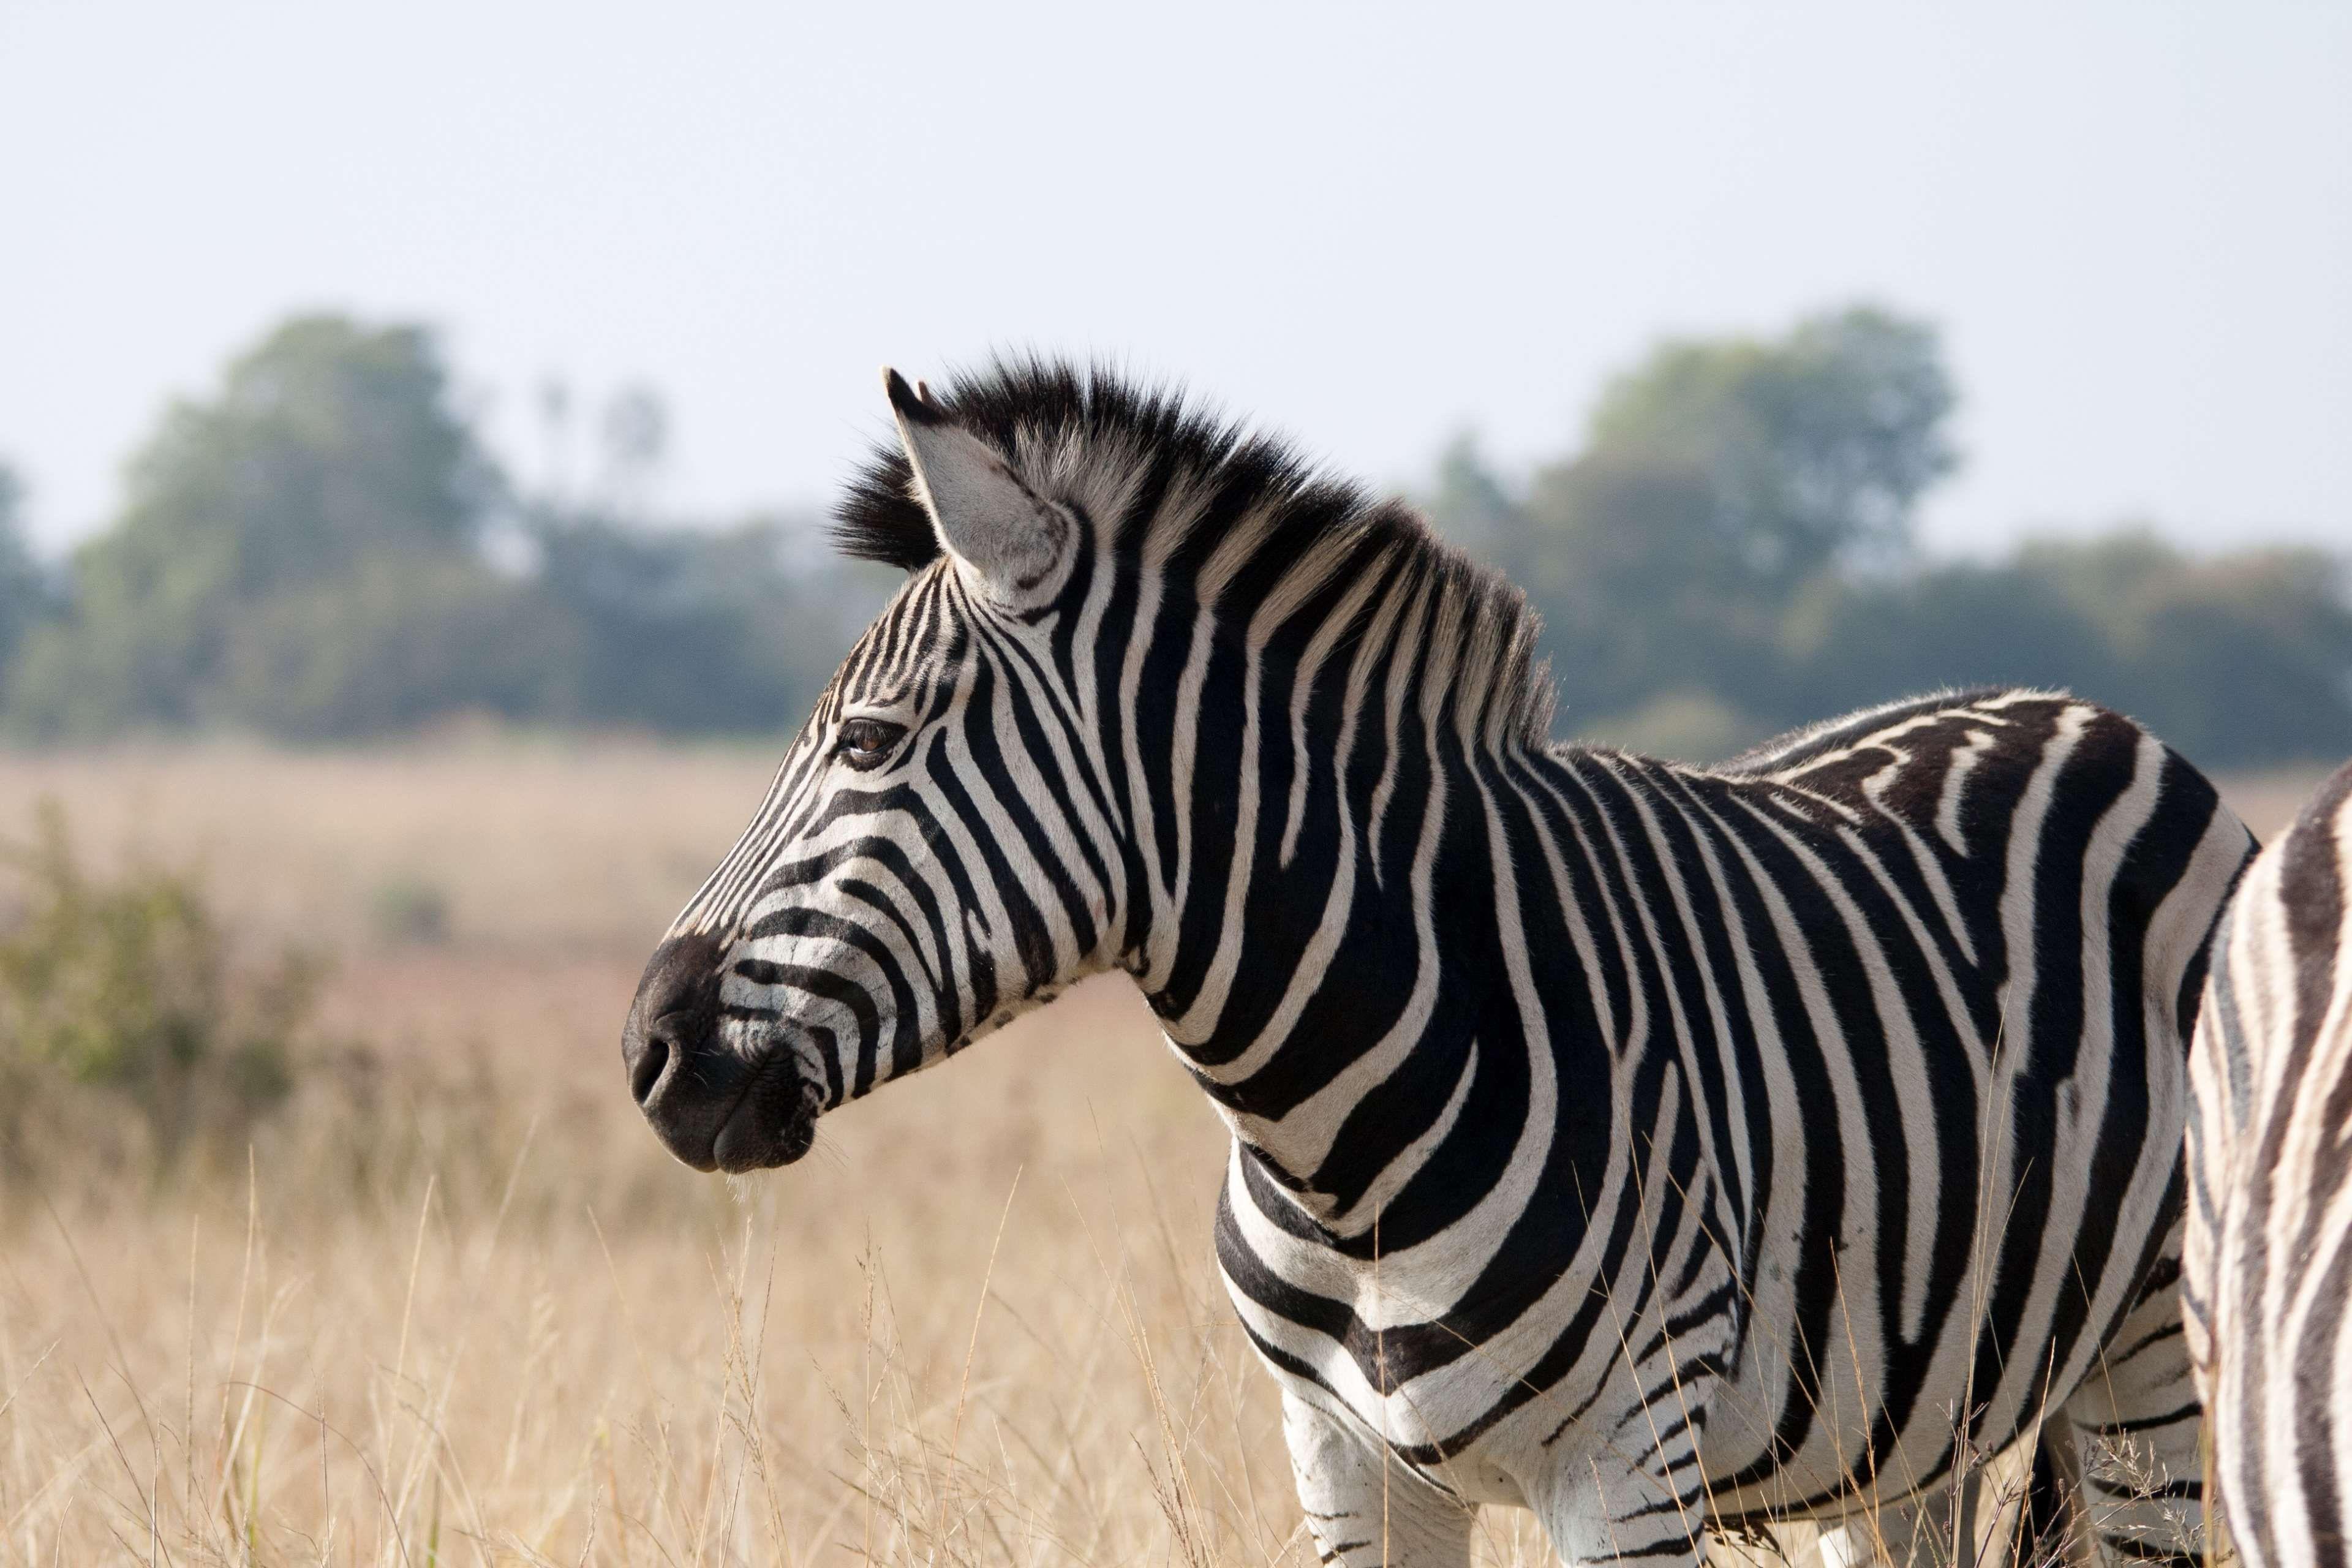 animal, banded, black, game, grass, mammal, nature